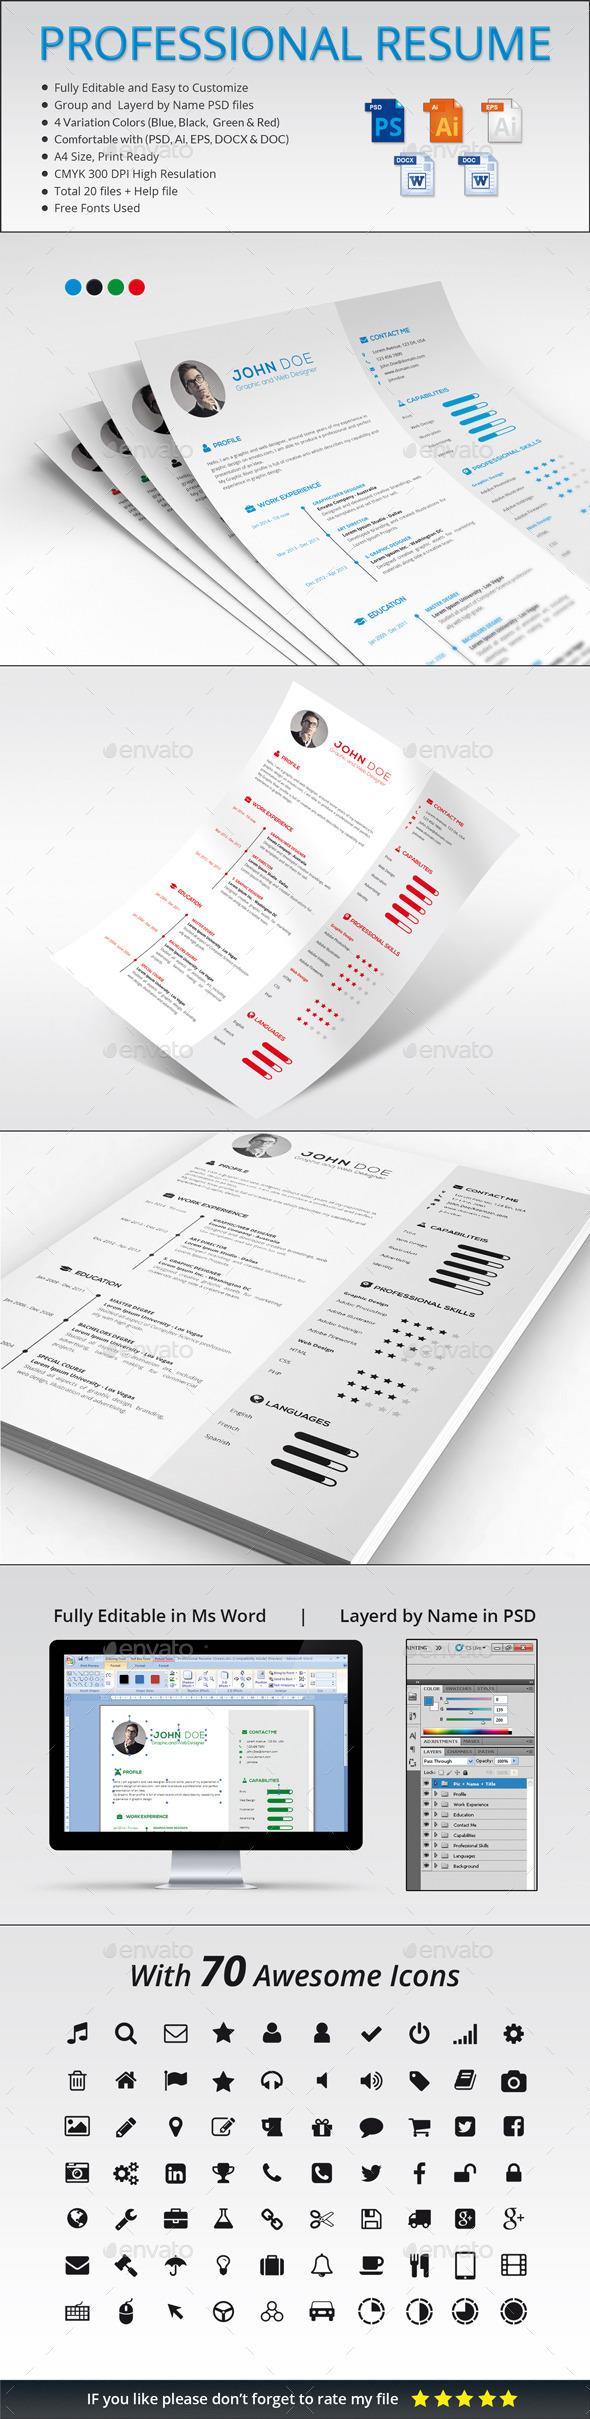 Professional Resume Template PSD, Vector EPS, AI design